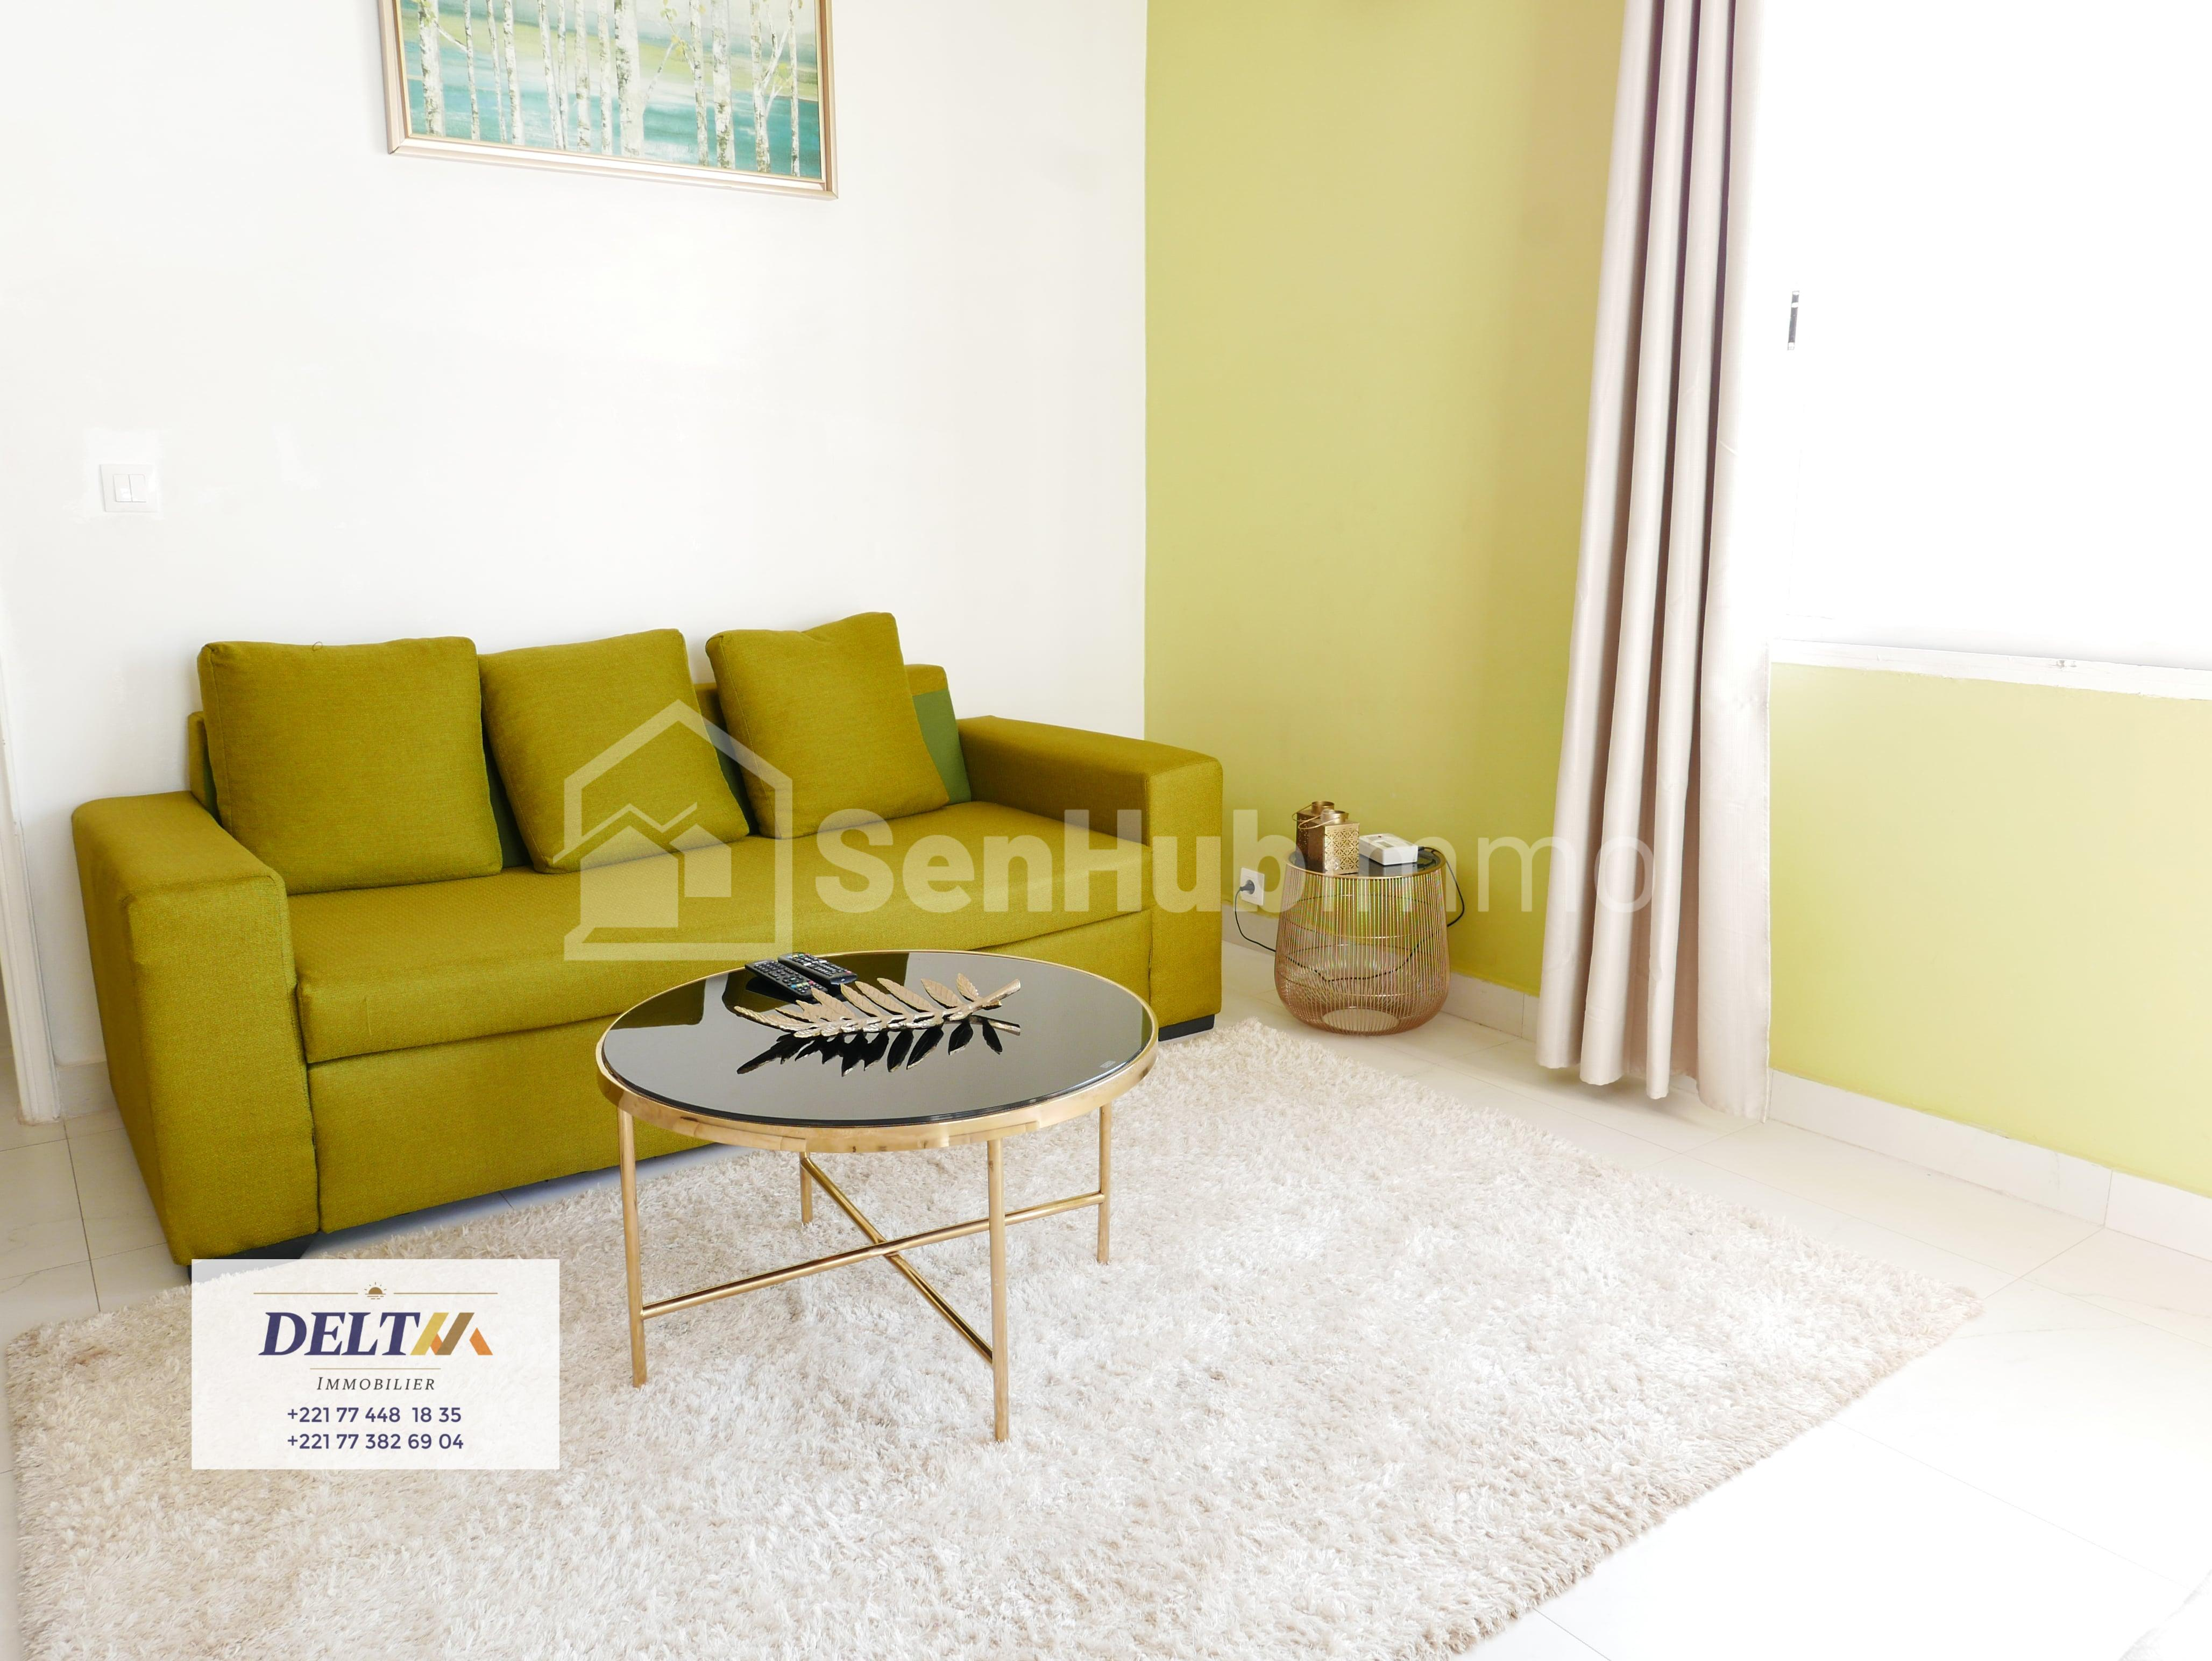 Appartement 2 chambres salon, Ngor - SenhubImmo.com